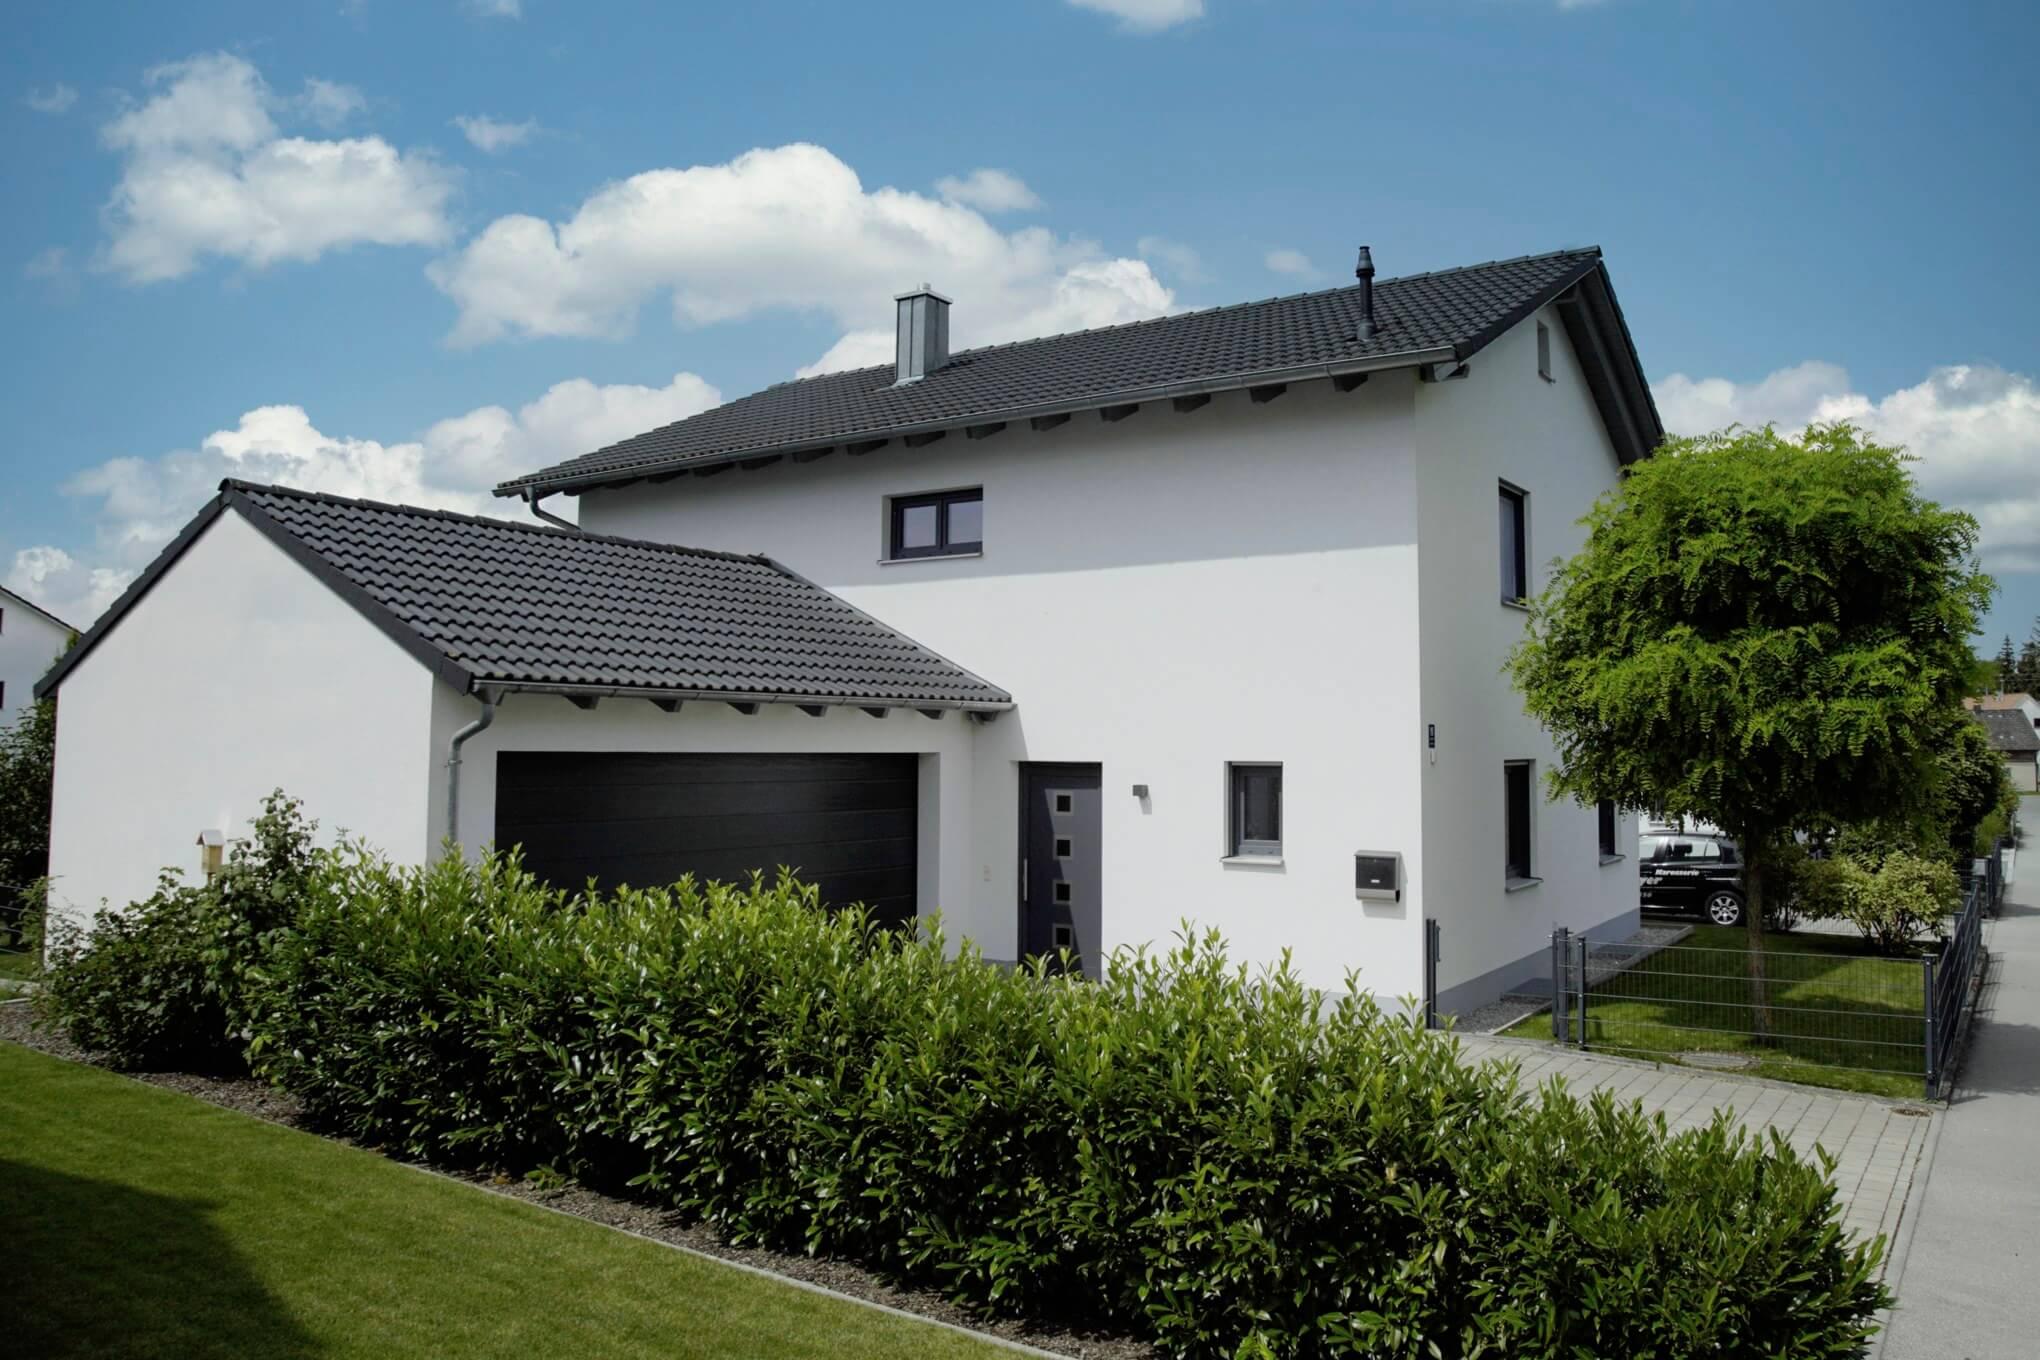 K&K Bau GmbH Massivhaus Referenzbild 15